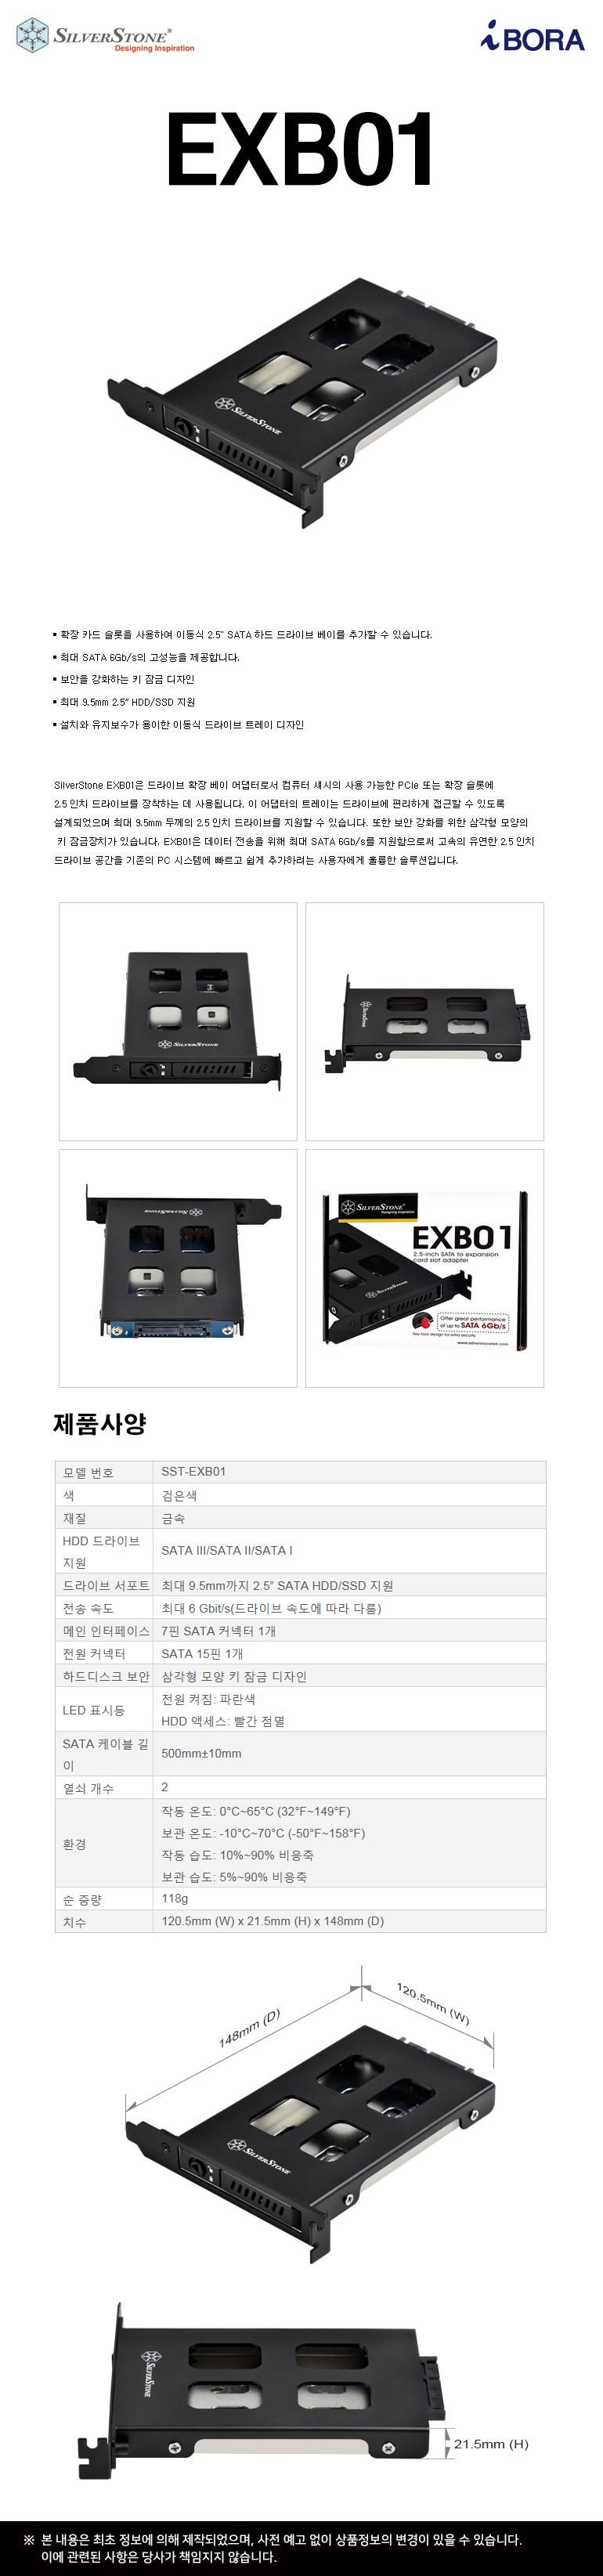 SilverStone  SST-EXB01